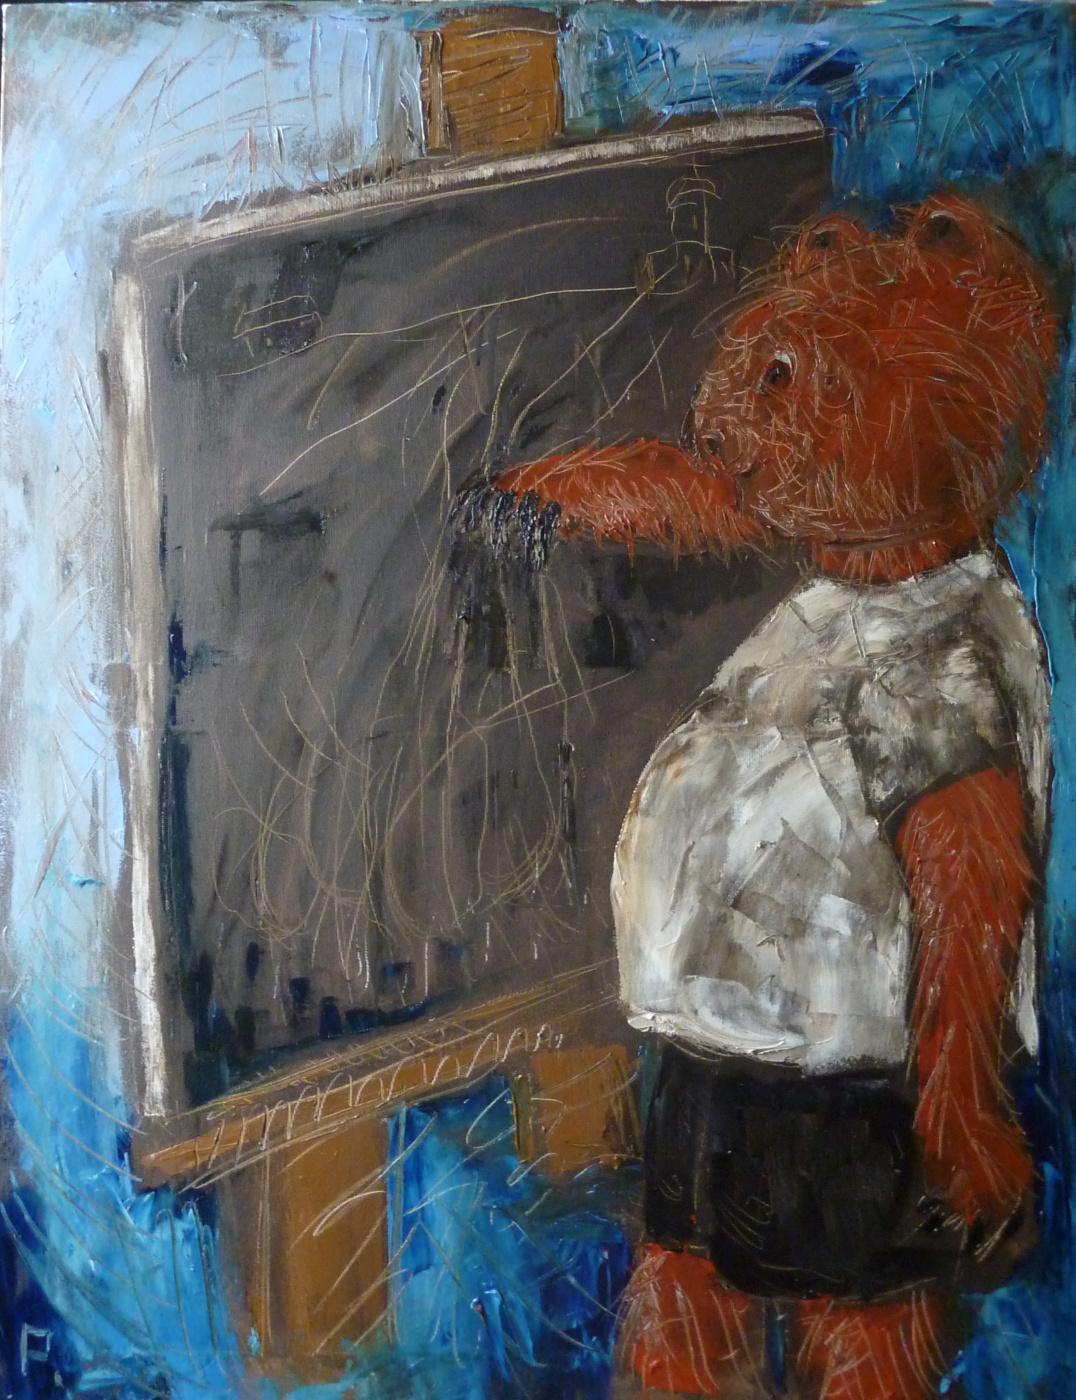 Svyatoslav Svyatoslav Ryabkin Ryabkin. Bear at easel Медведь у мольберта